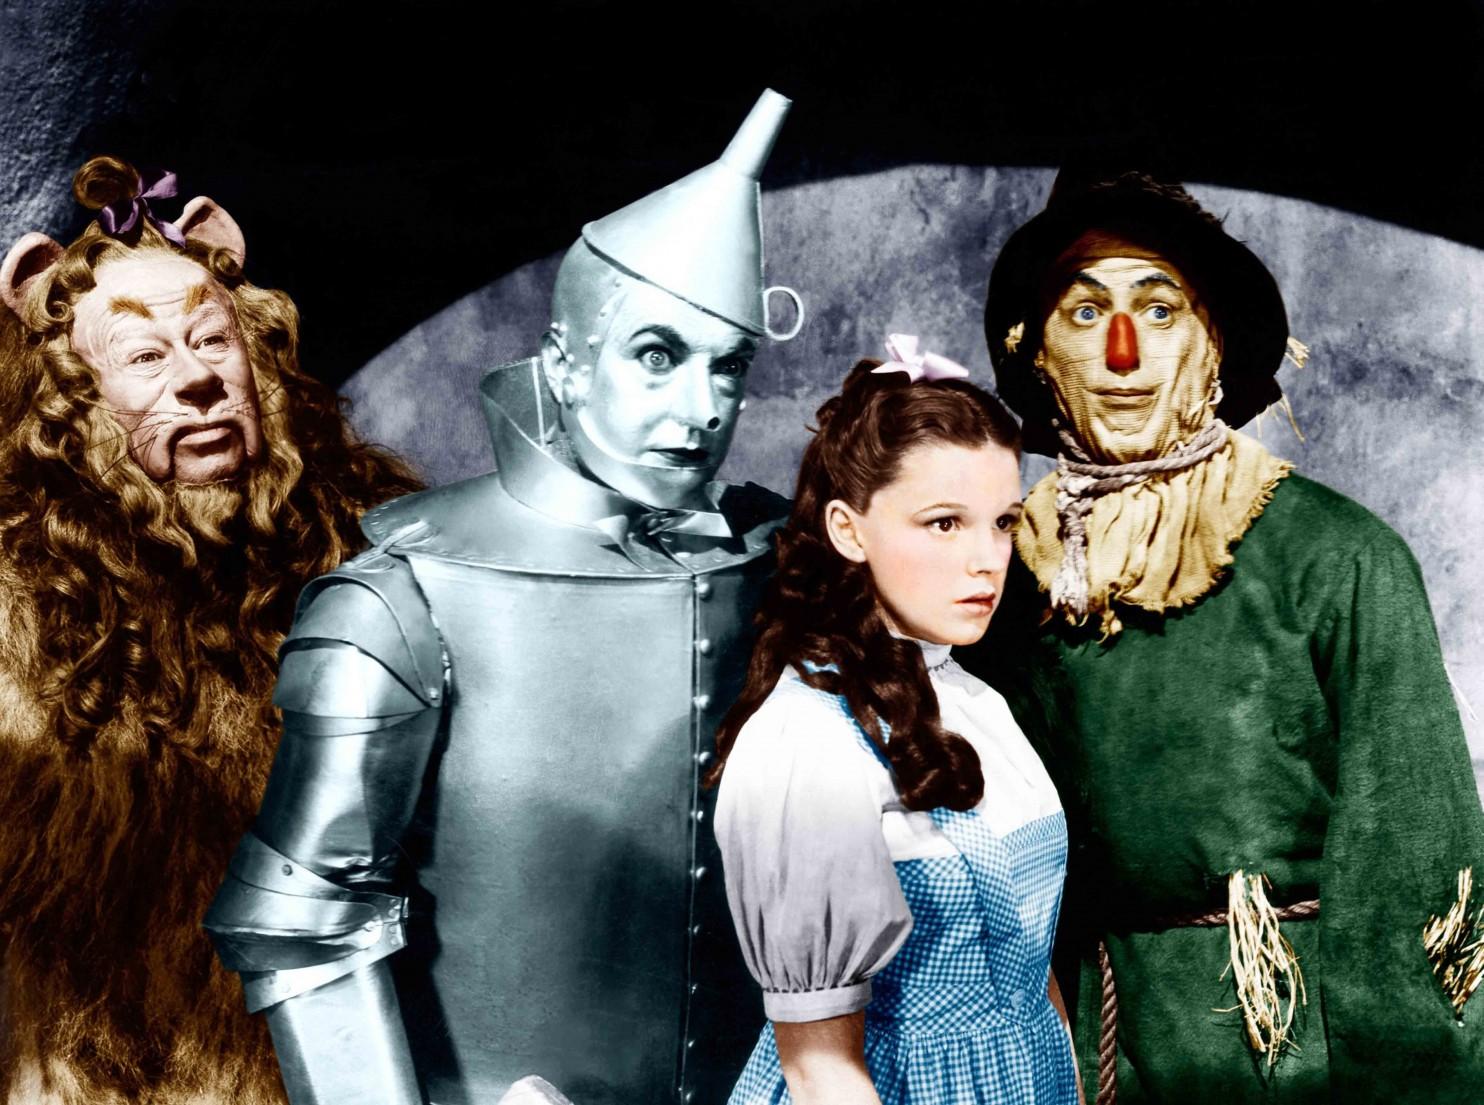 Wizard of Oz stars in costume